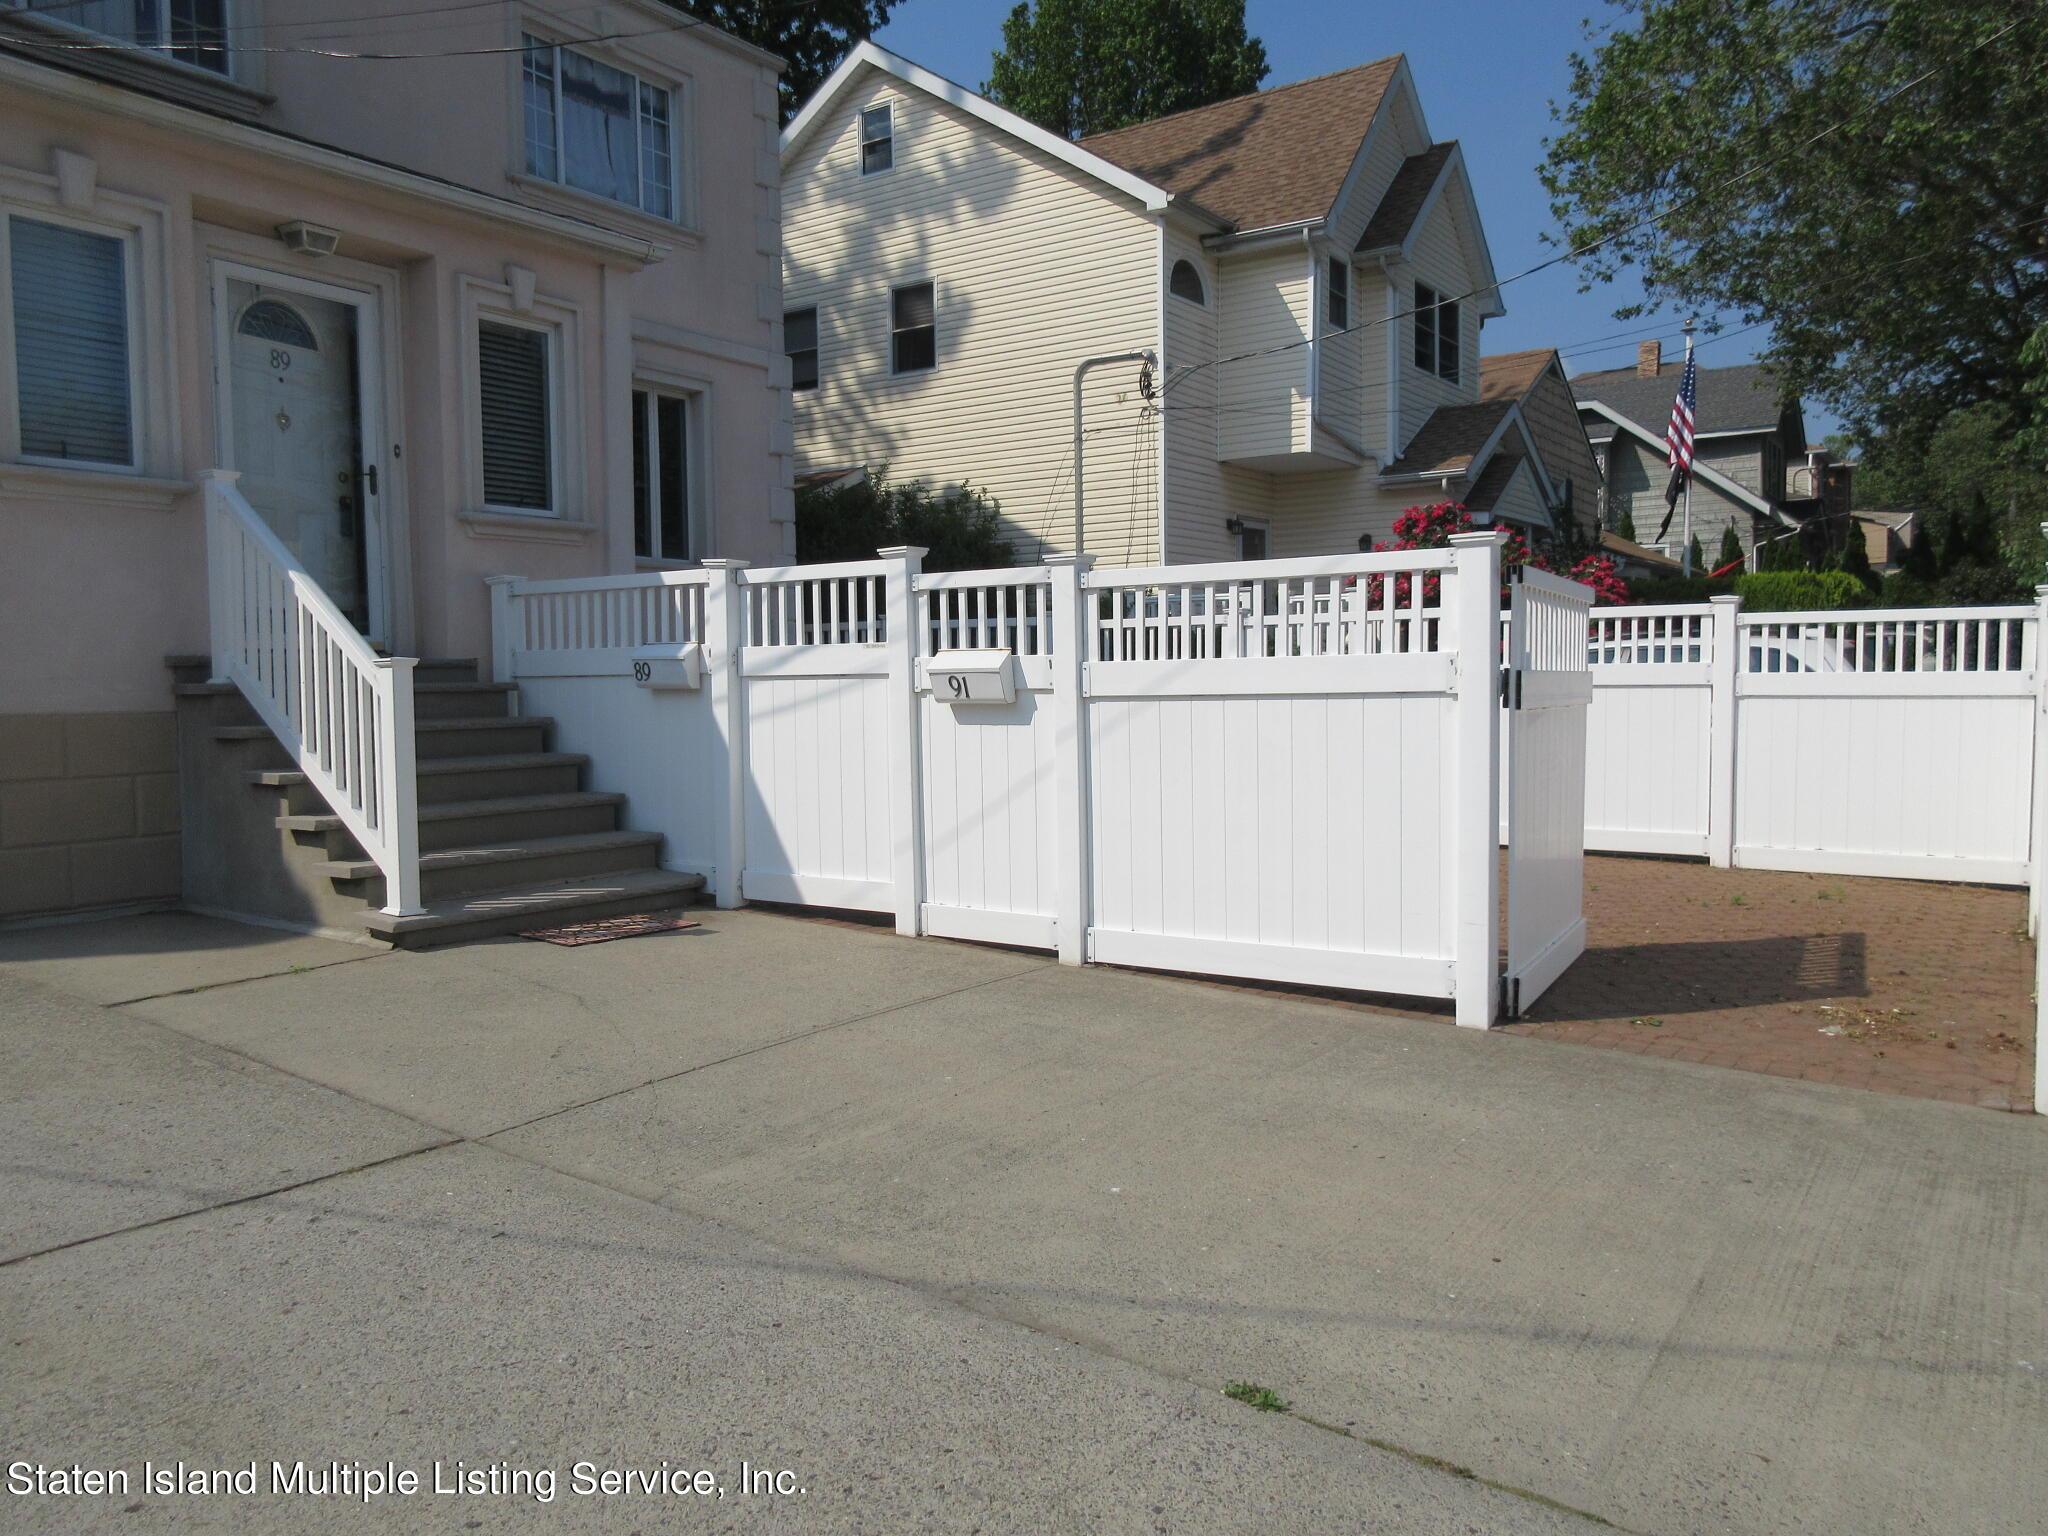 Two Family - Detached 89-91 David Street  Staten Island, NY 10308, MLS-1146516-2